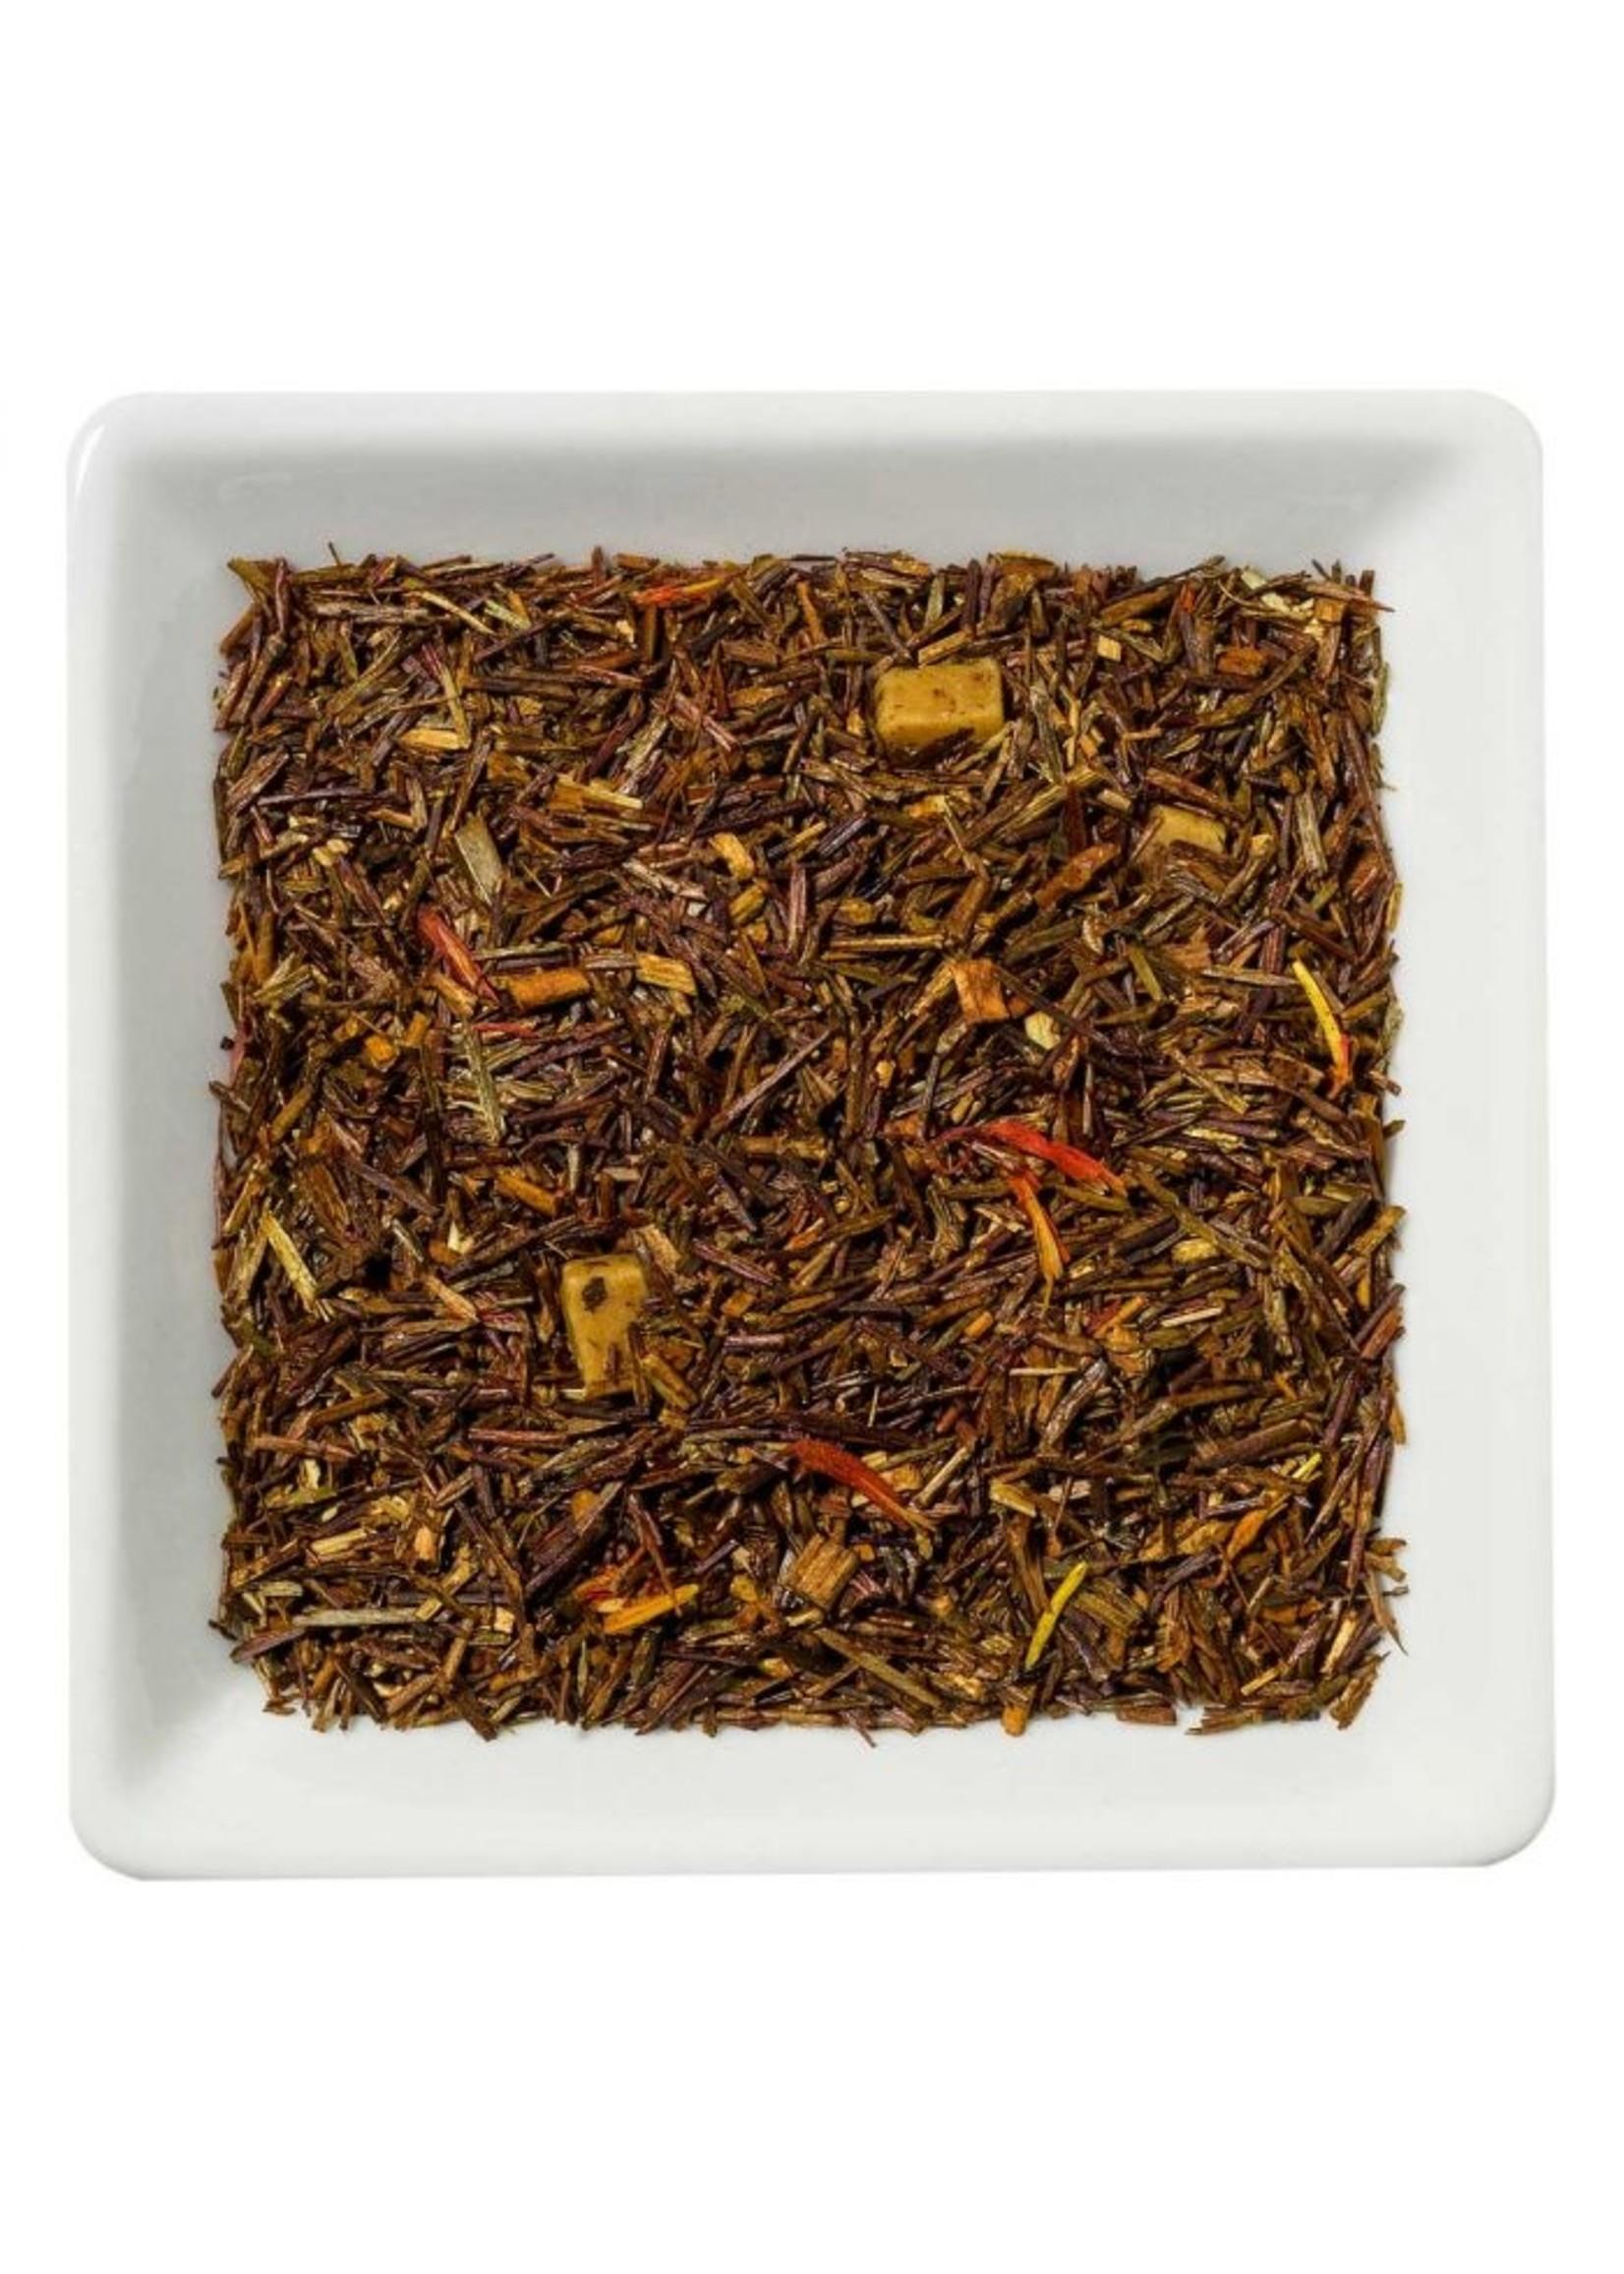 De KoffieMeulen Rooibos Crispy Caramel